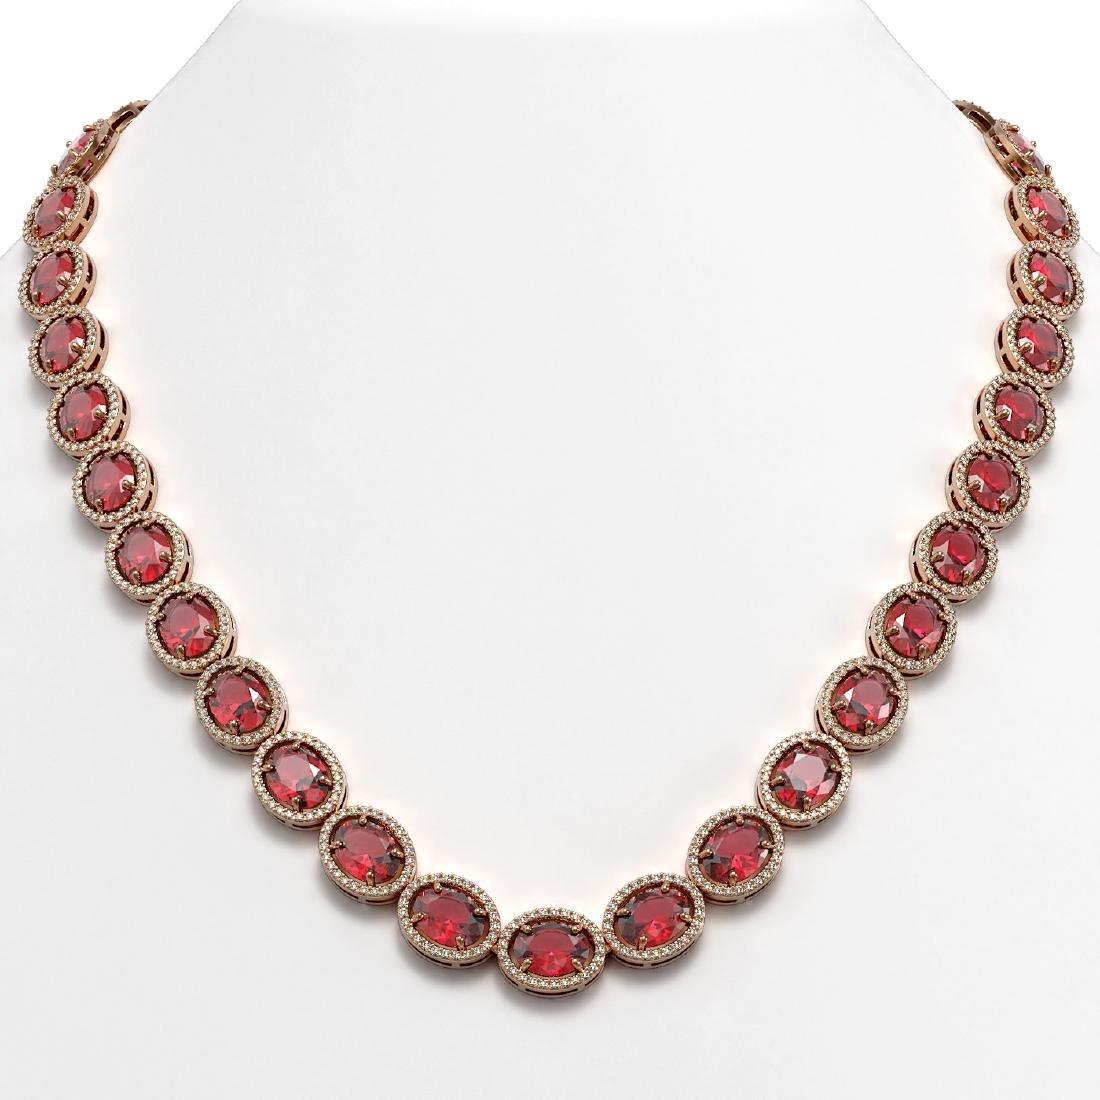 54.48 CTW Tourmaline & Diamond Halo Necklace 10K Rose